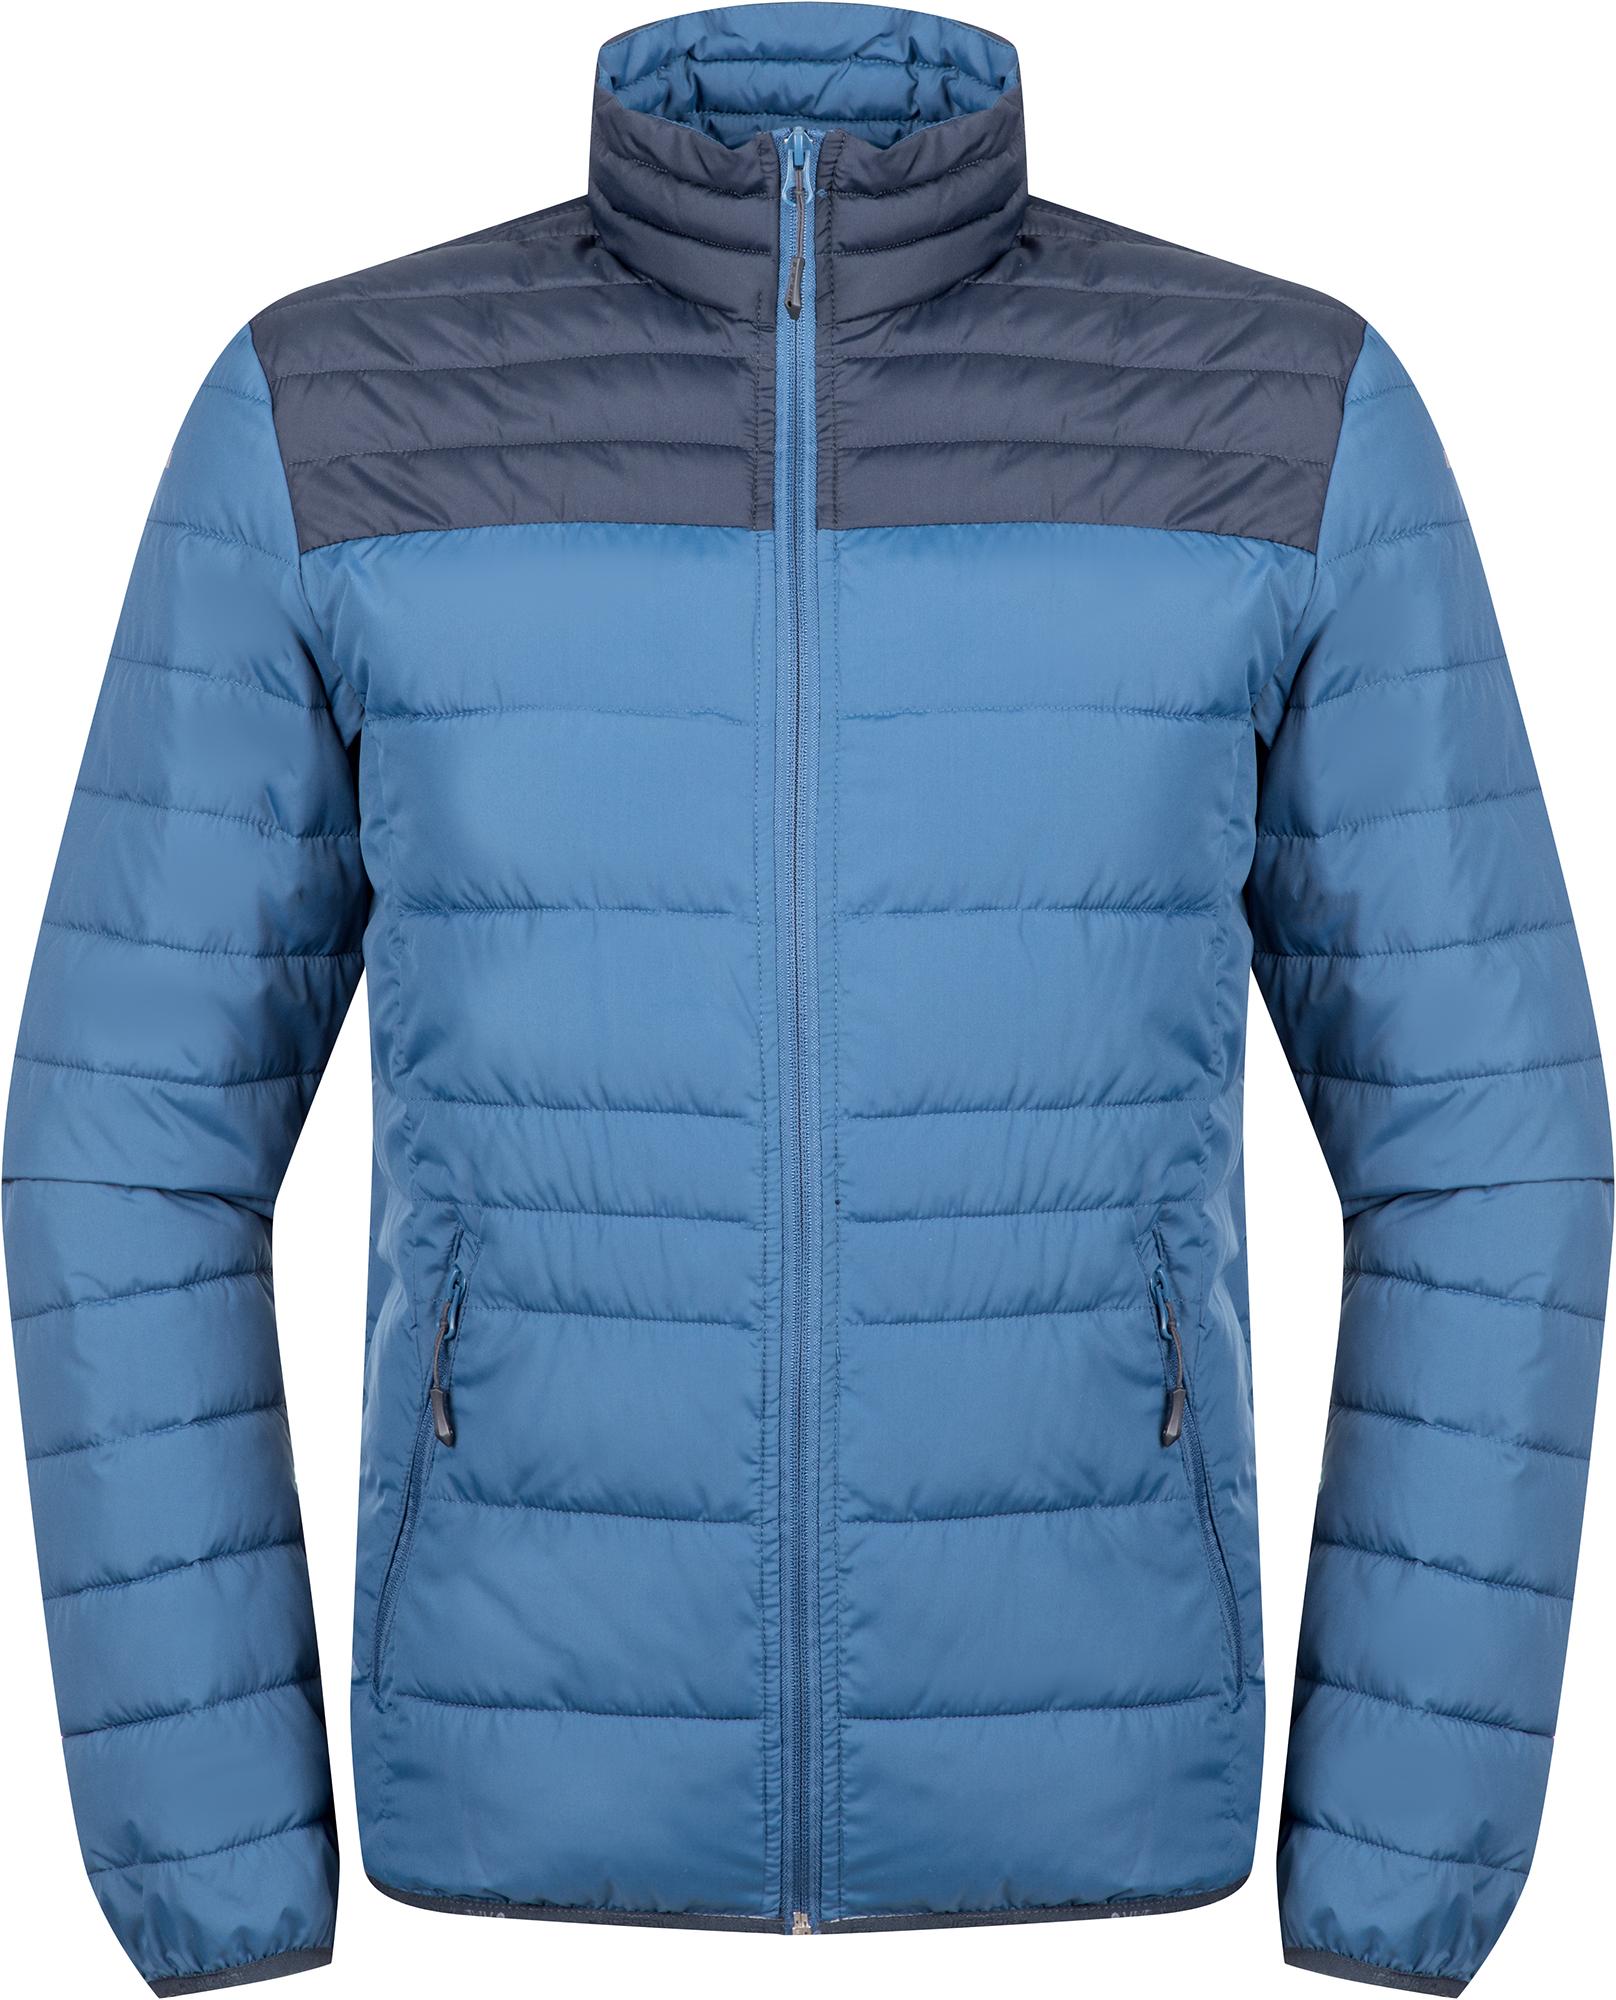 IcePeak Куртка утепленная мужская IcePeak Vannes, размер 52 цена 2017